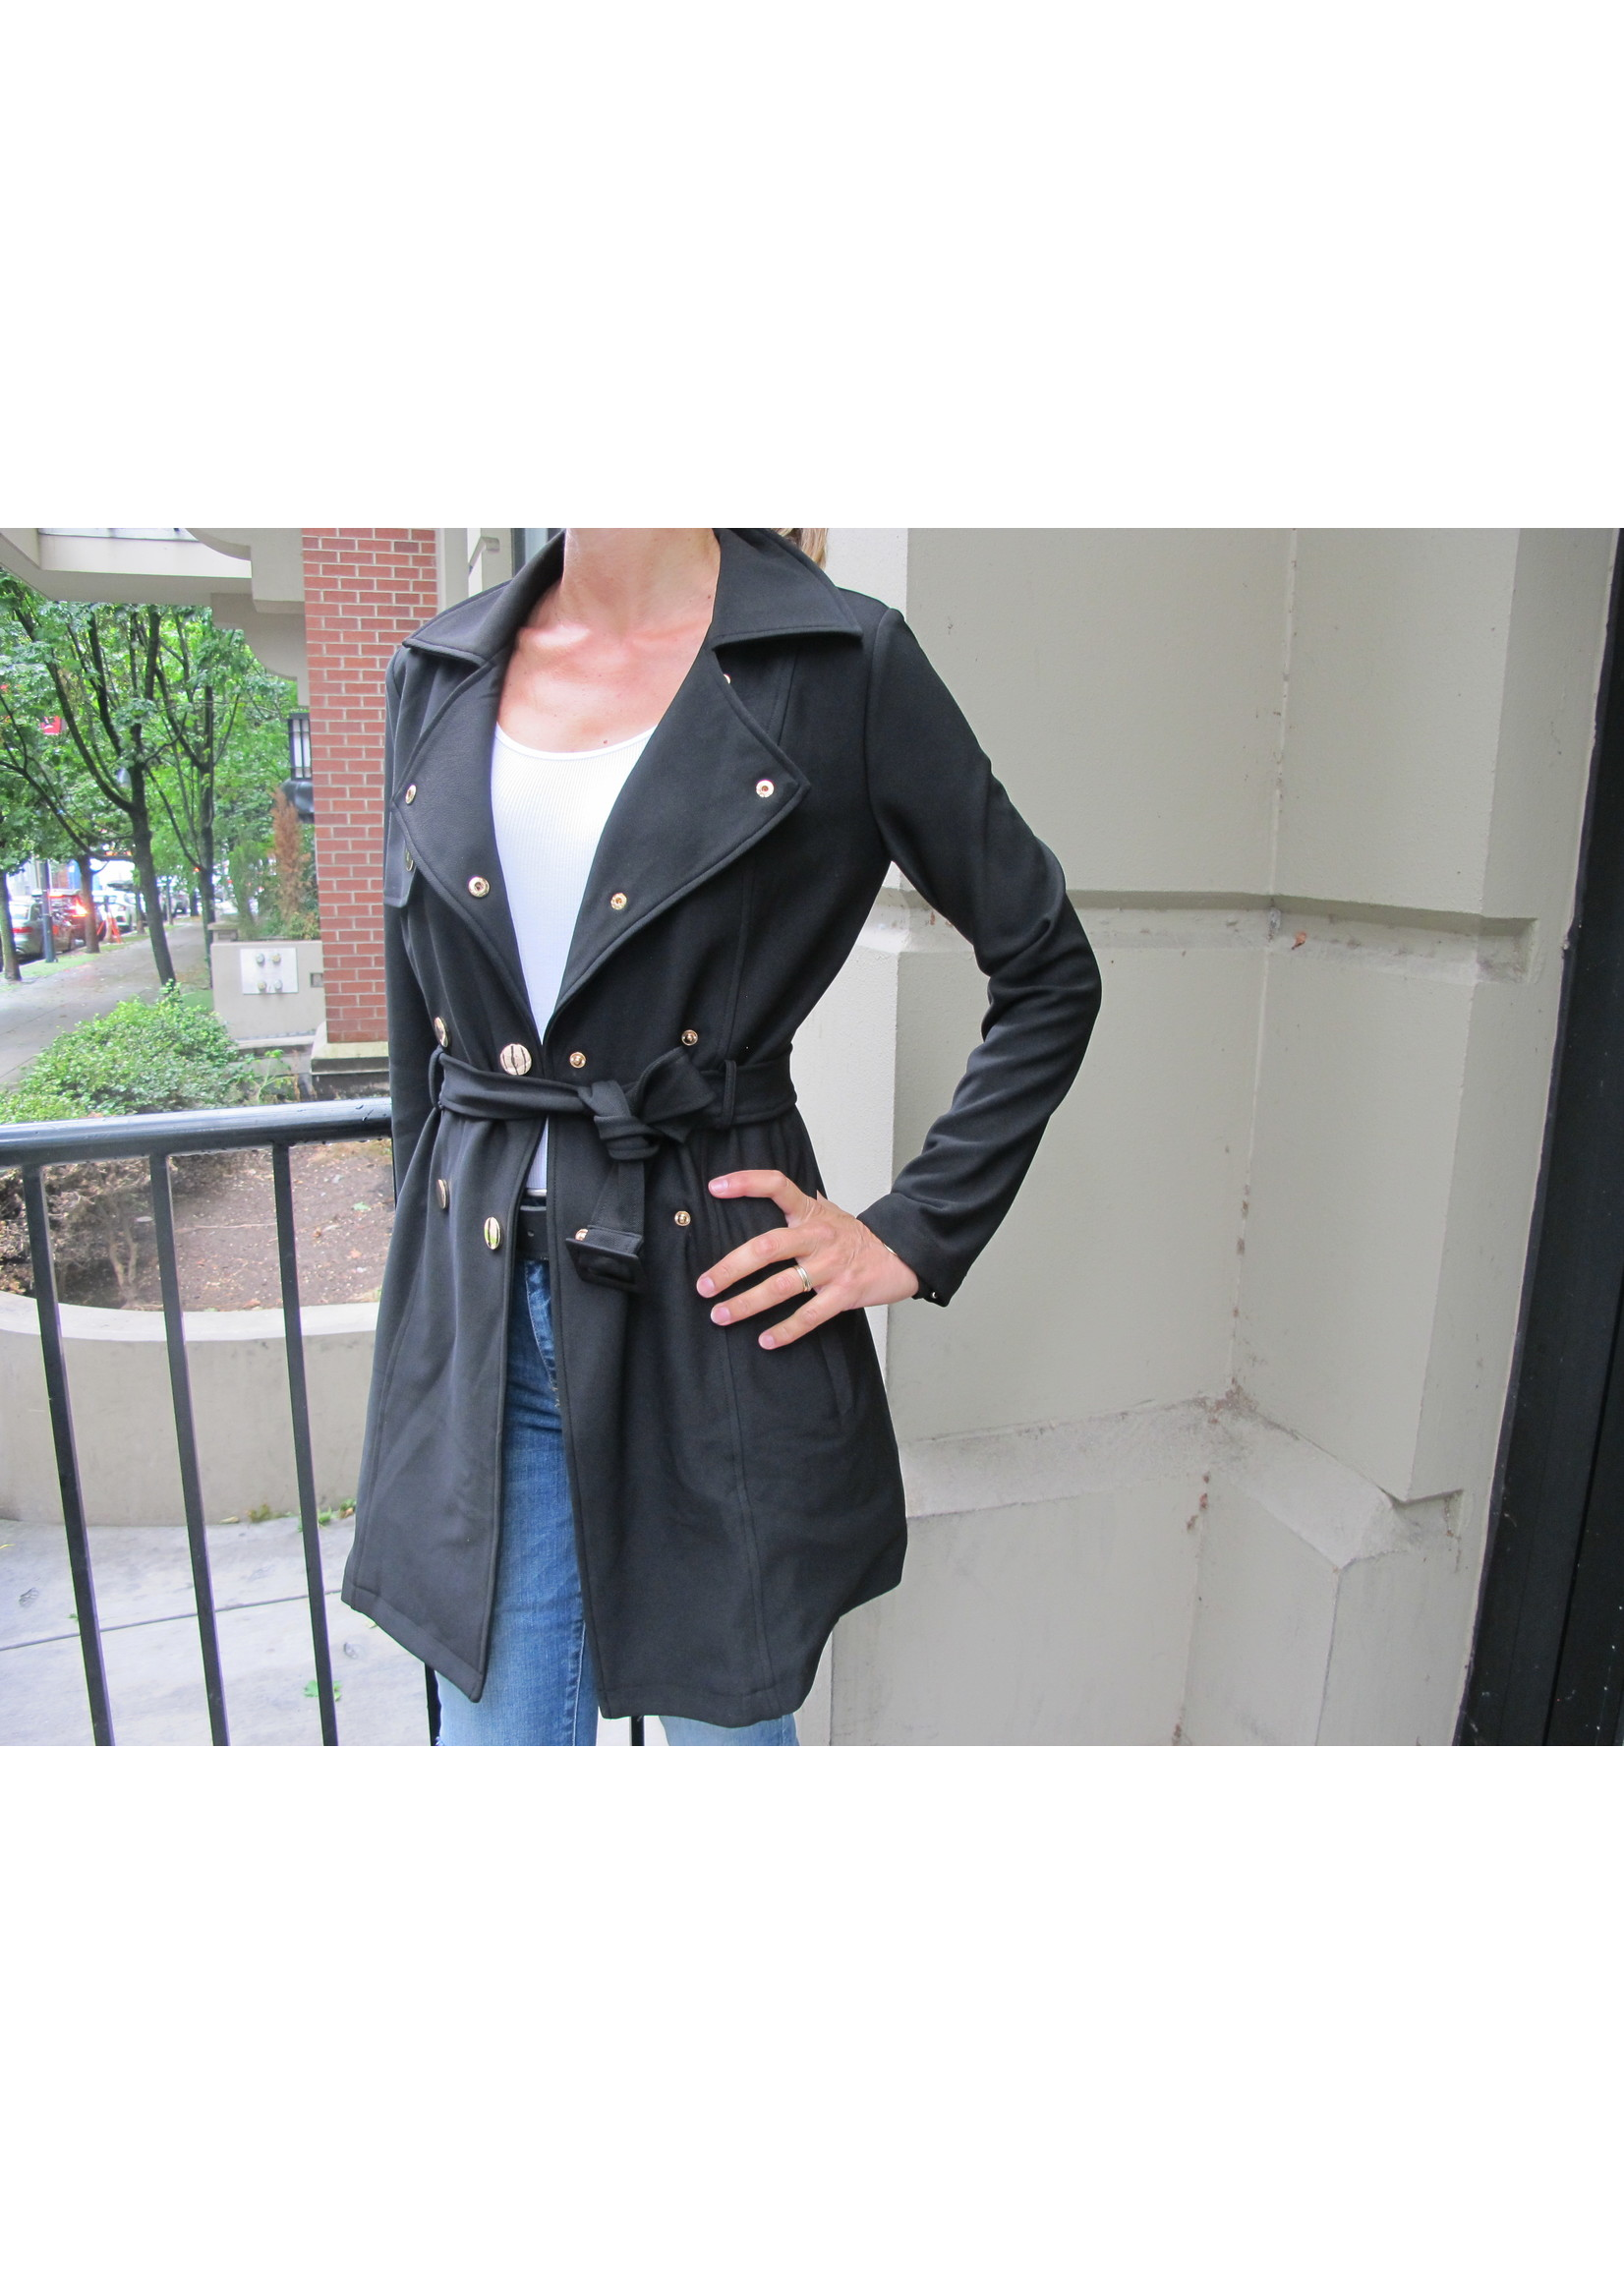 Privy Evangeline Jacket Black